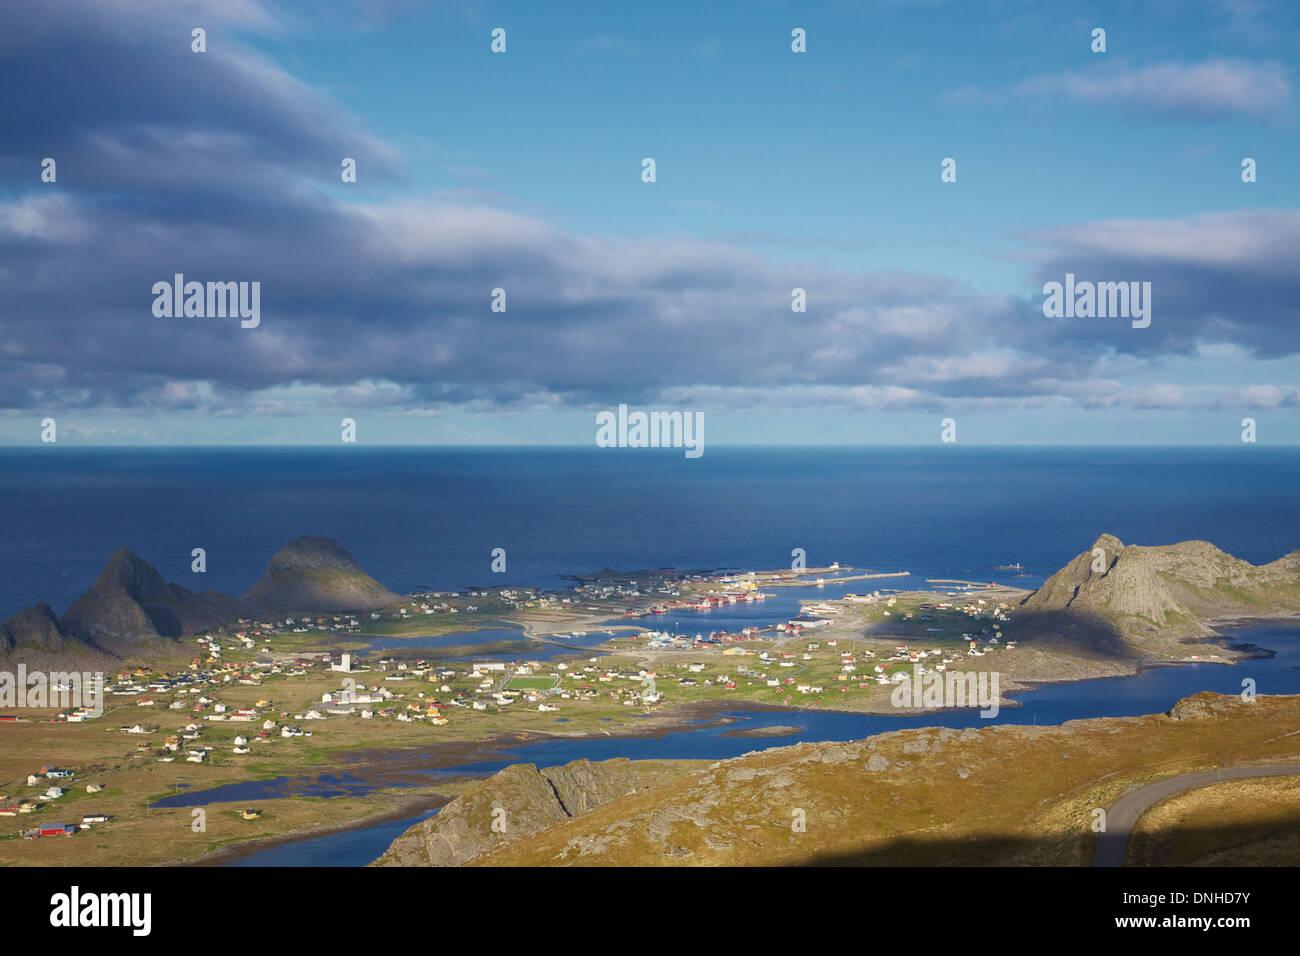 Scenic norwegian town Sorland with colorful houses on island of Vaeroy, Lofoten islands, Norway - Stock Image